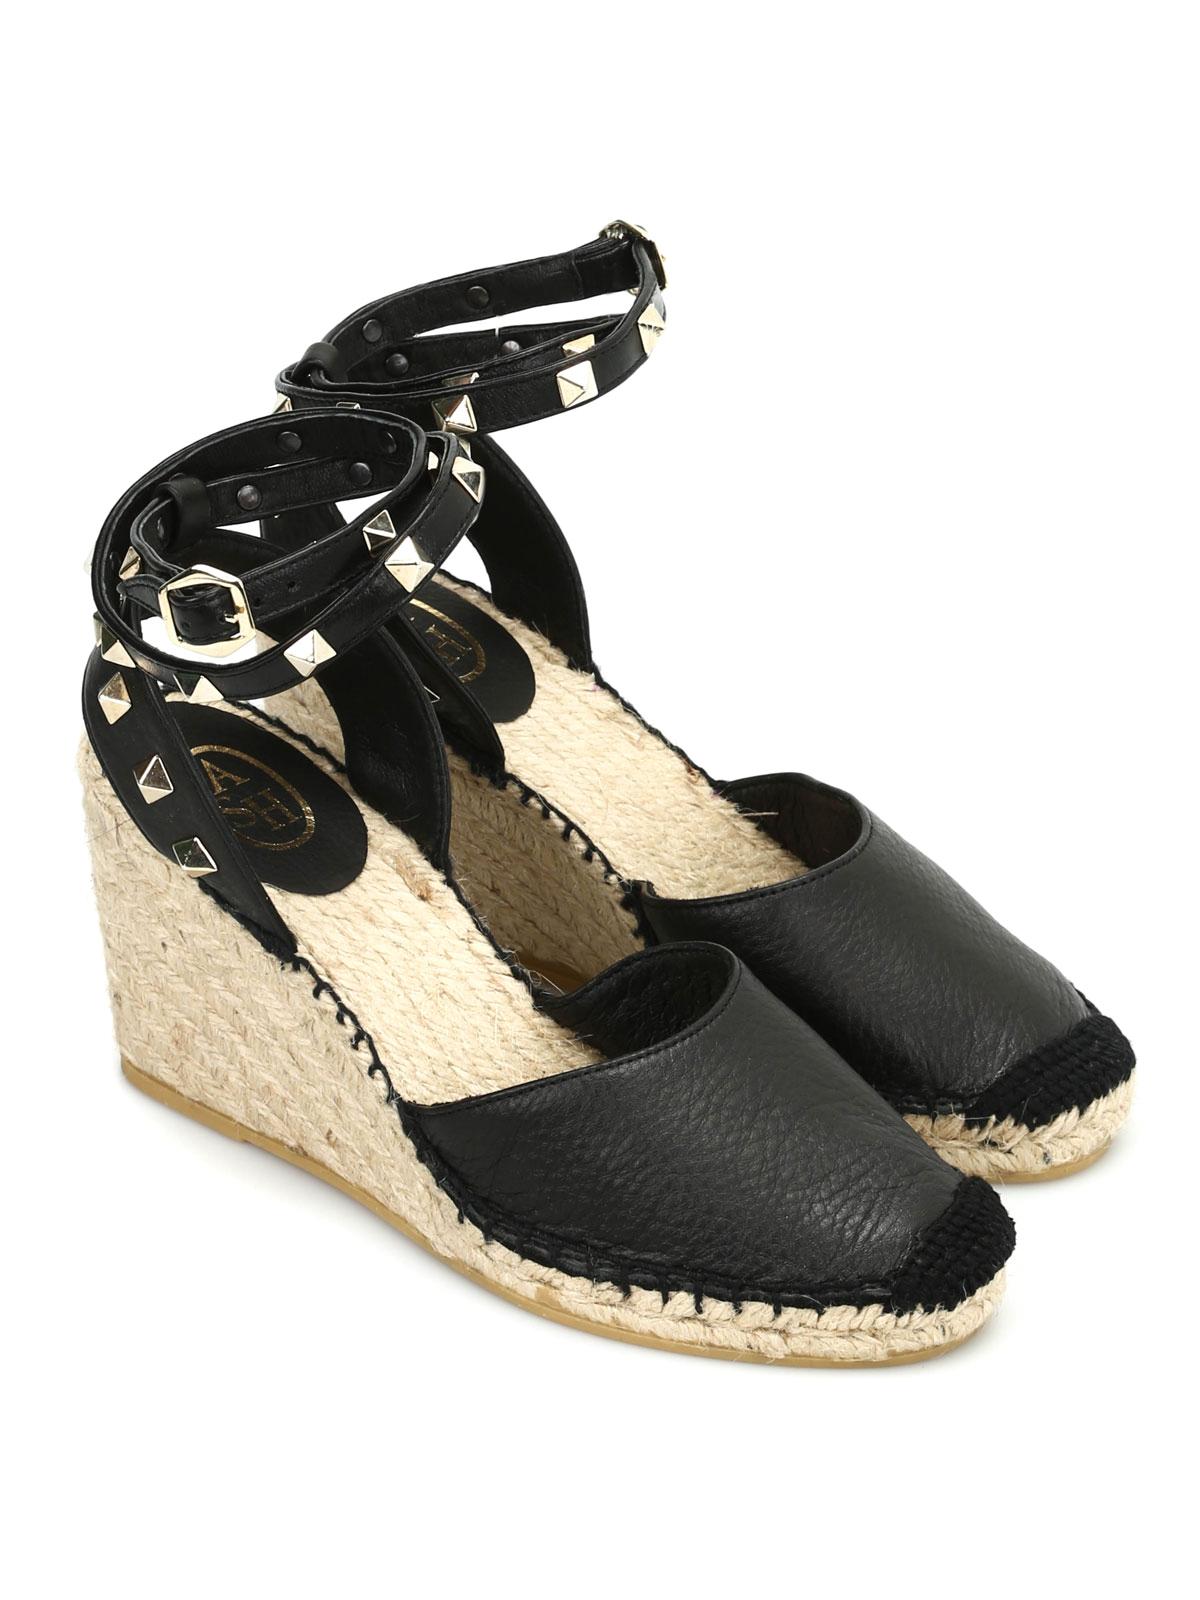 Ash - Winona leather sandals